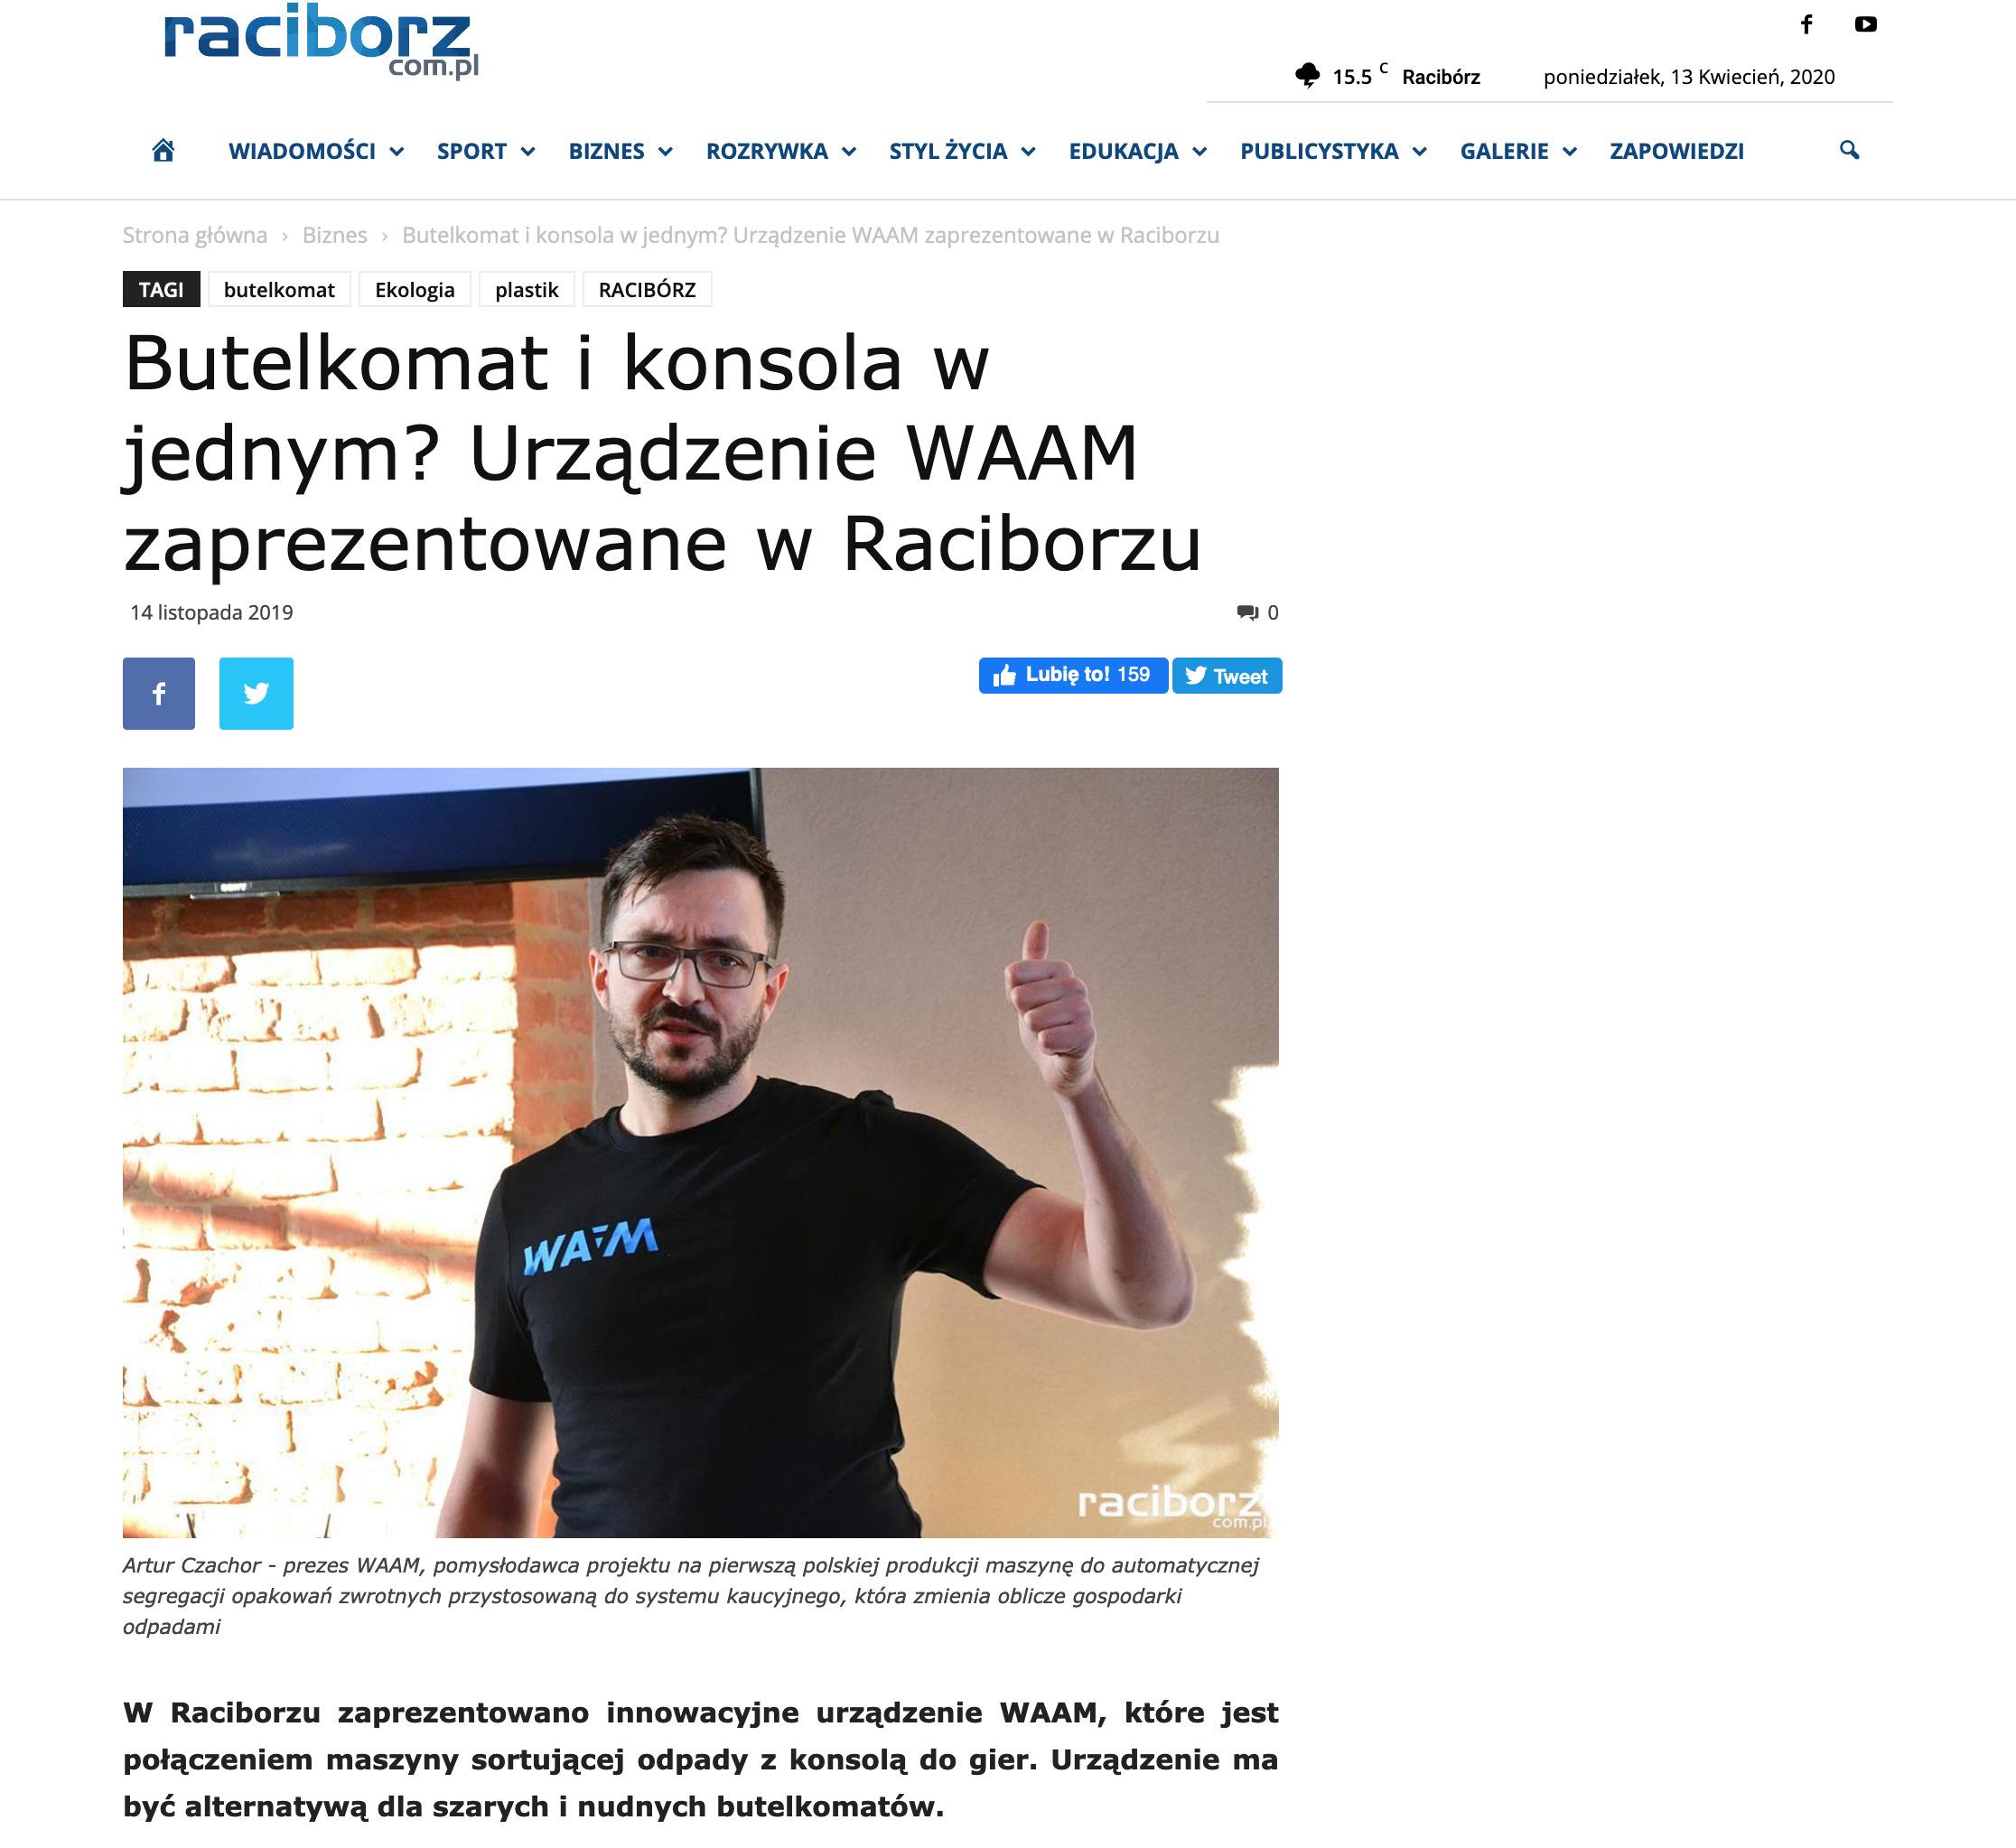 raciborz.com.pl 14.11.2019